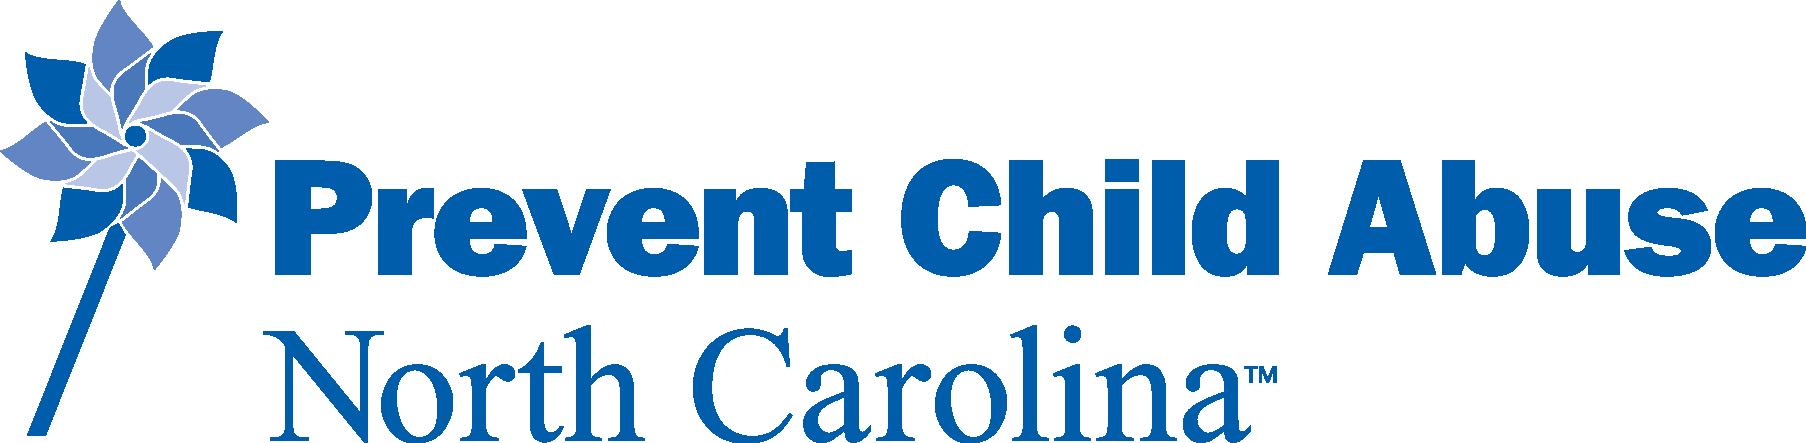 Sponsor Prevent Child Abuse North Carolina